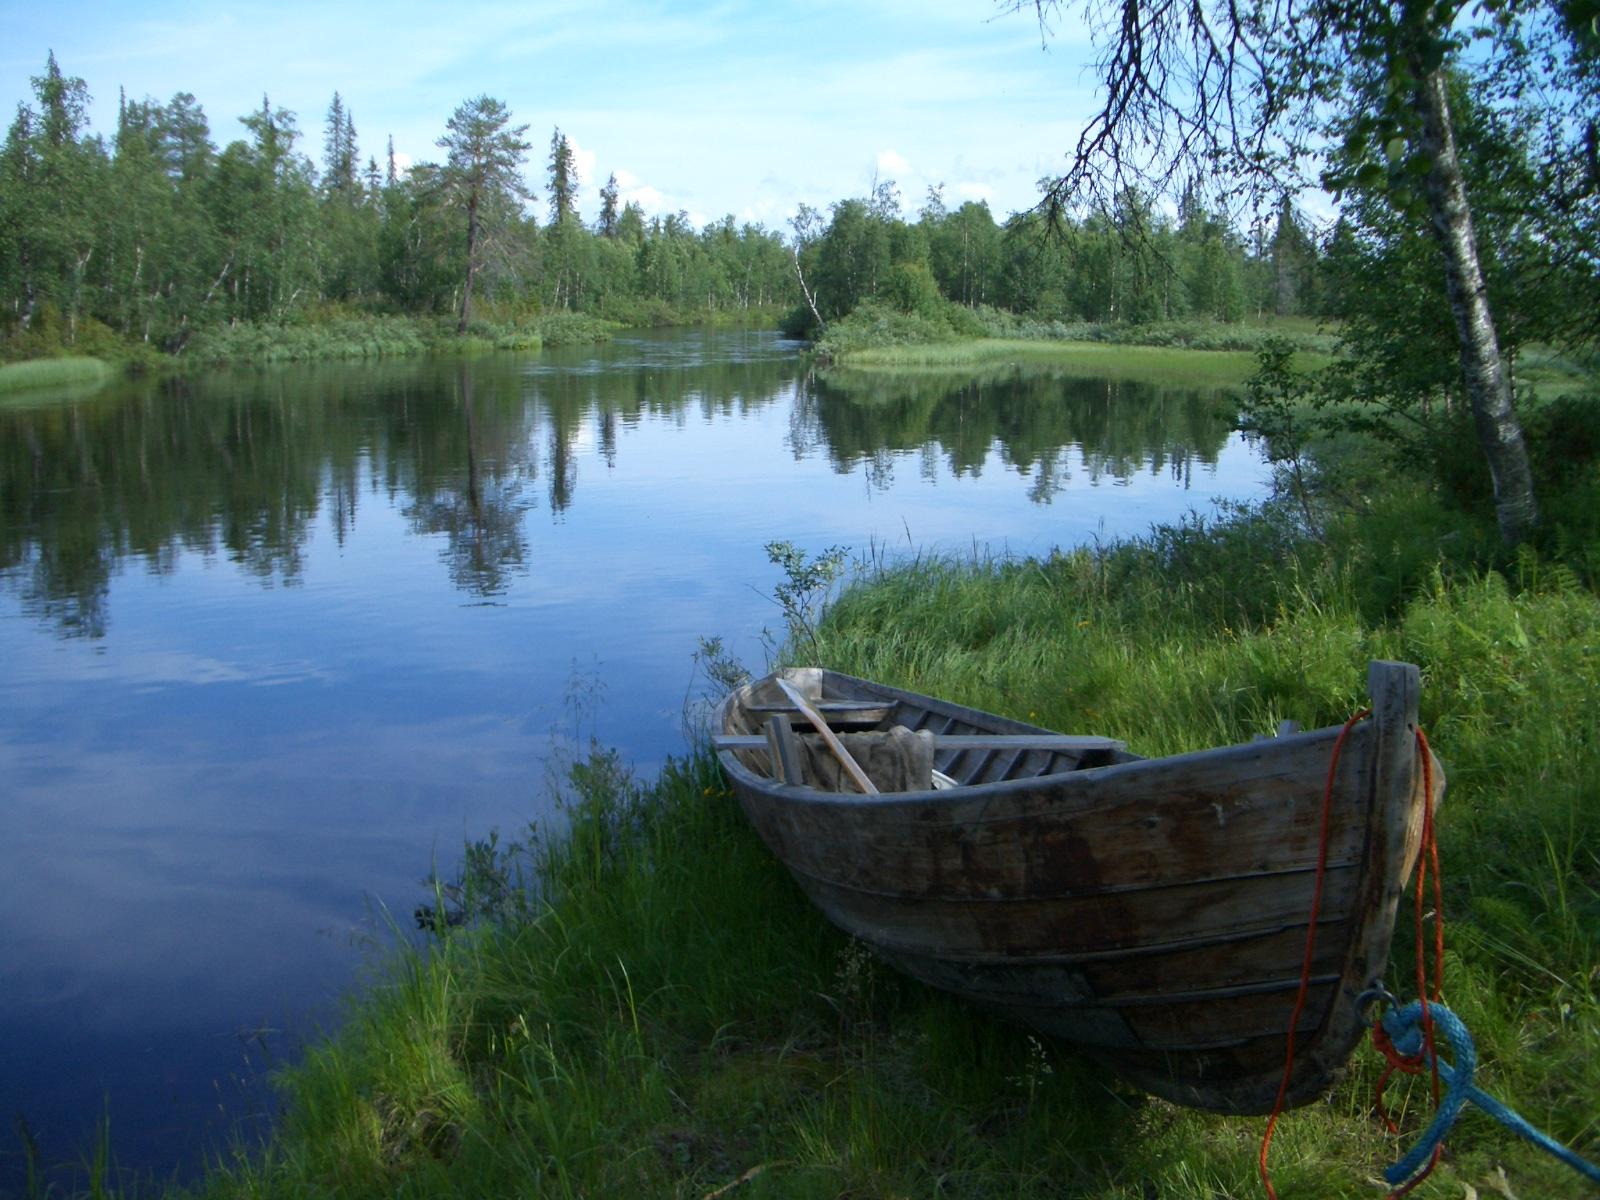 FileNaruska Salla Finlandjpg Wikimedia Commons